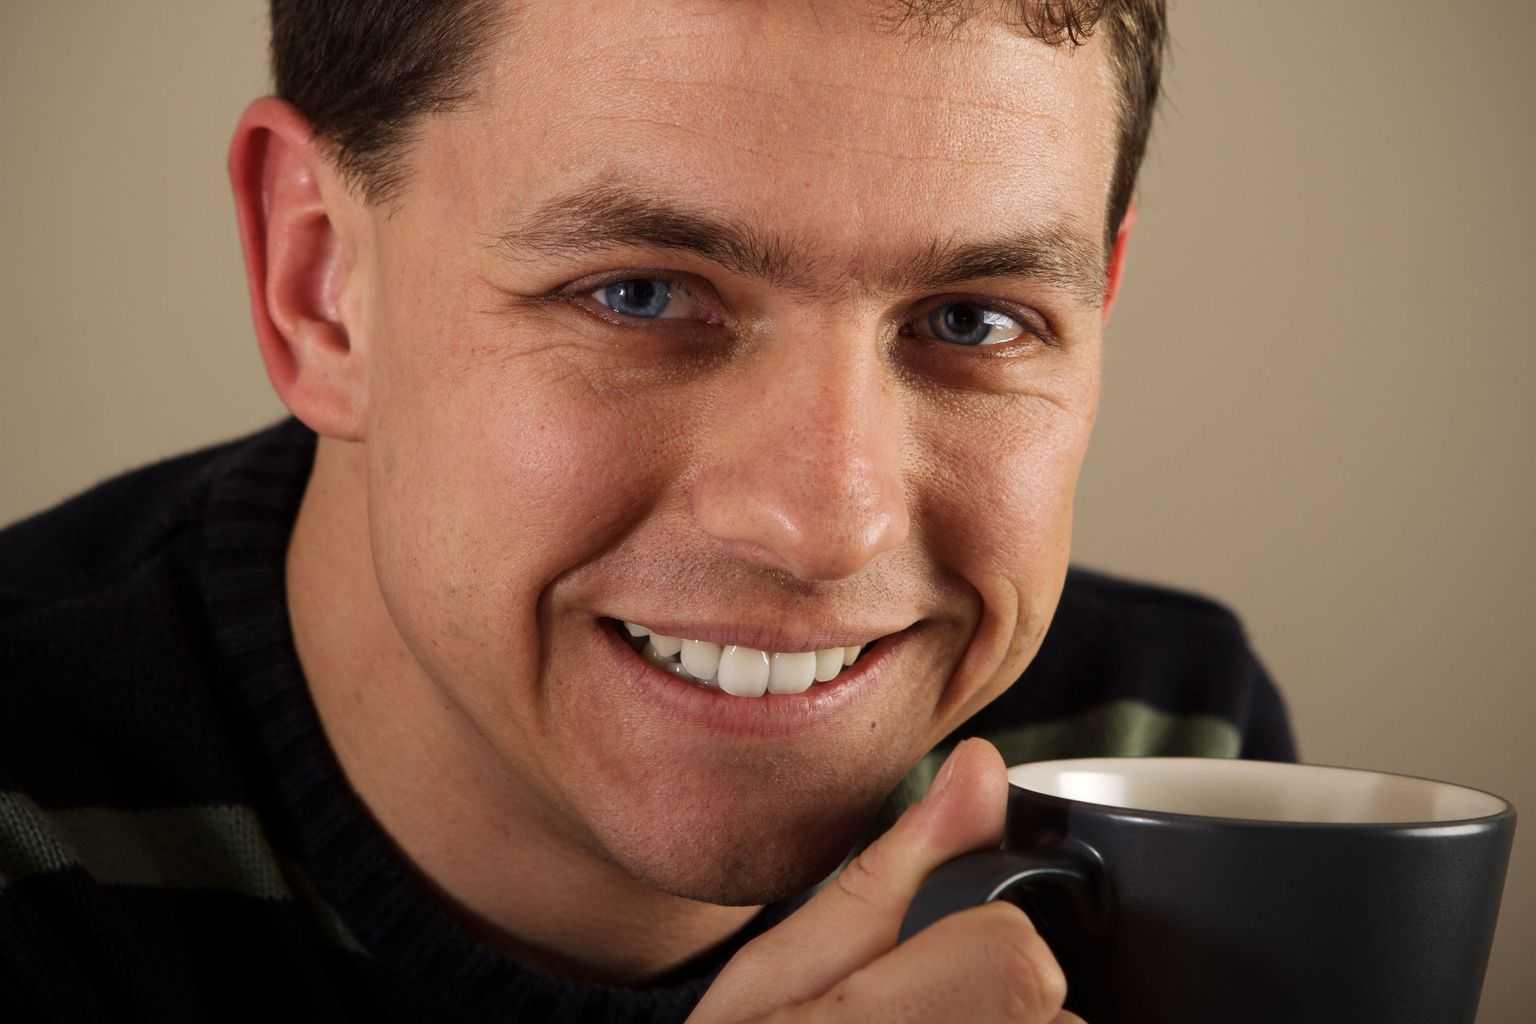 Is green tea unhealthy for men?